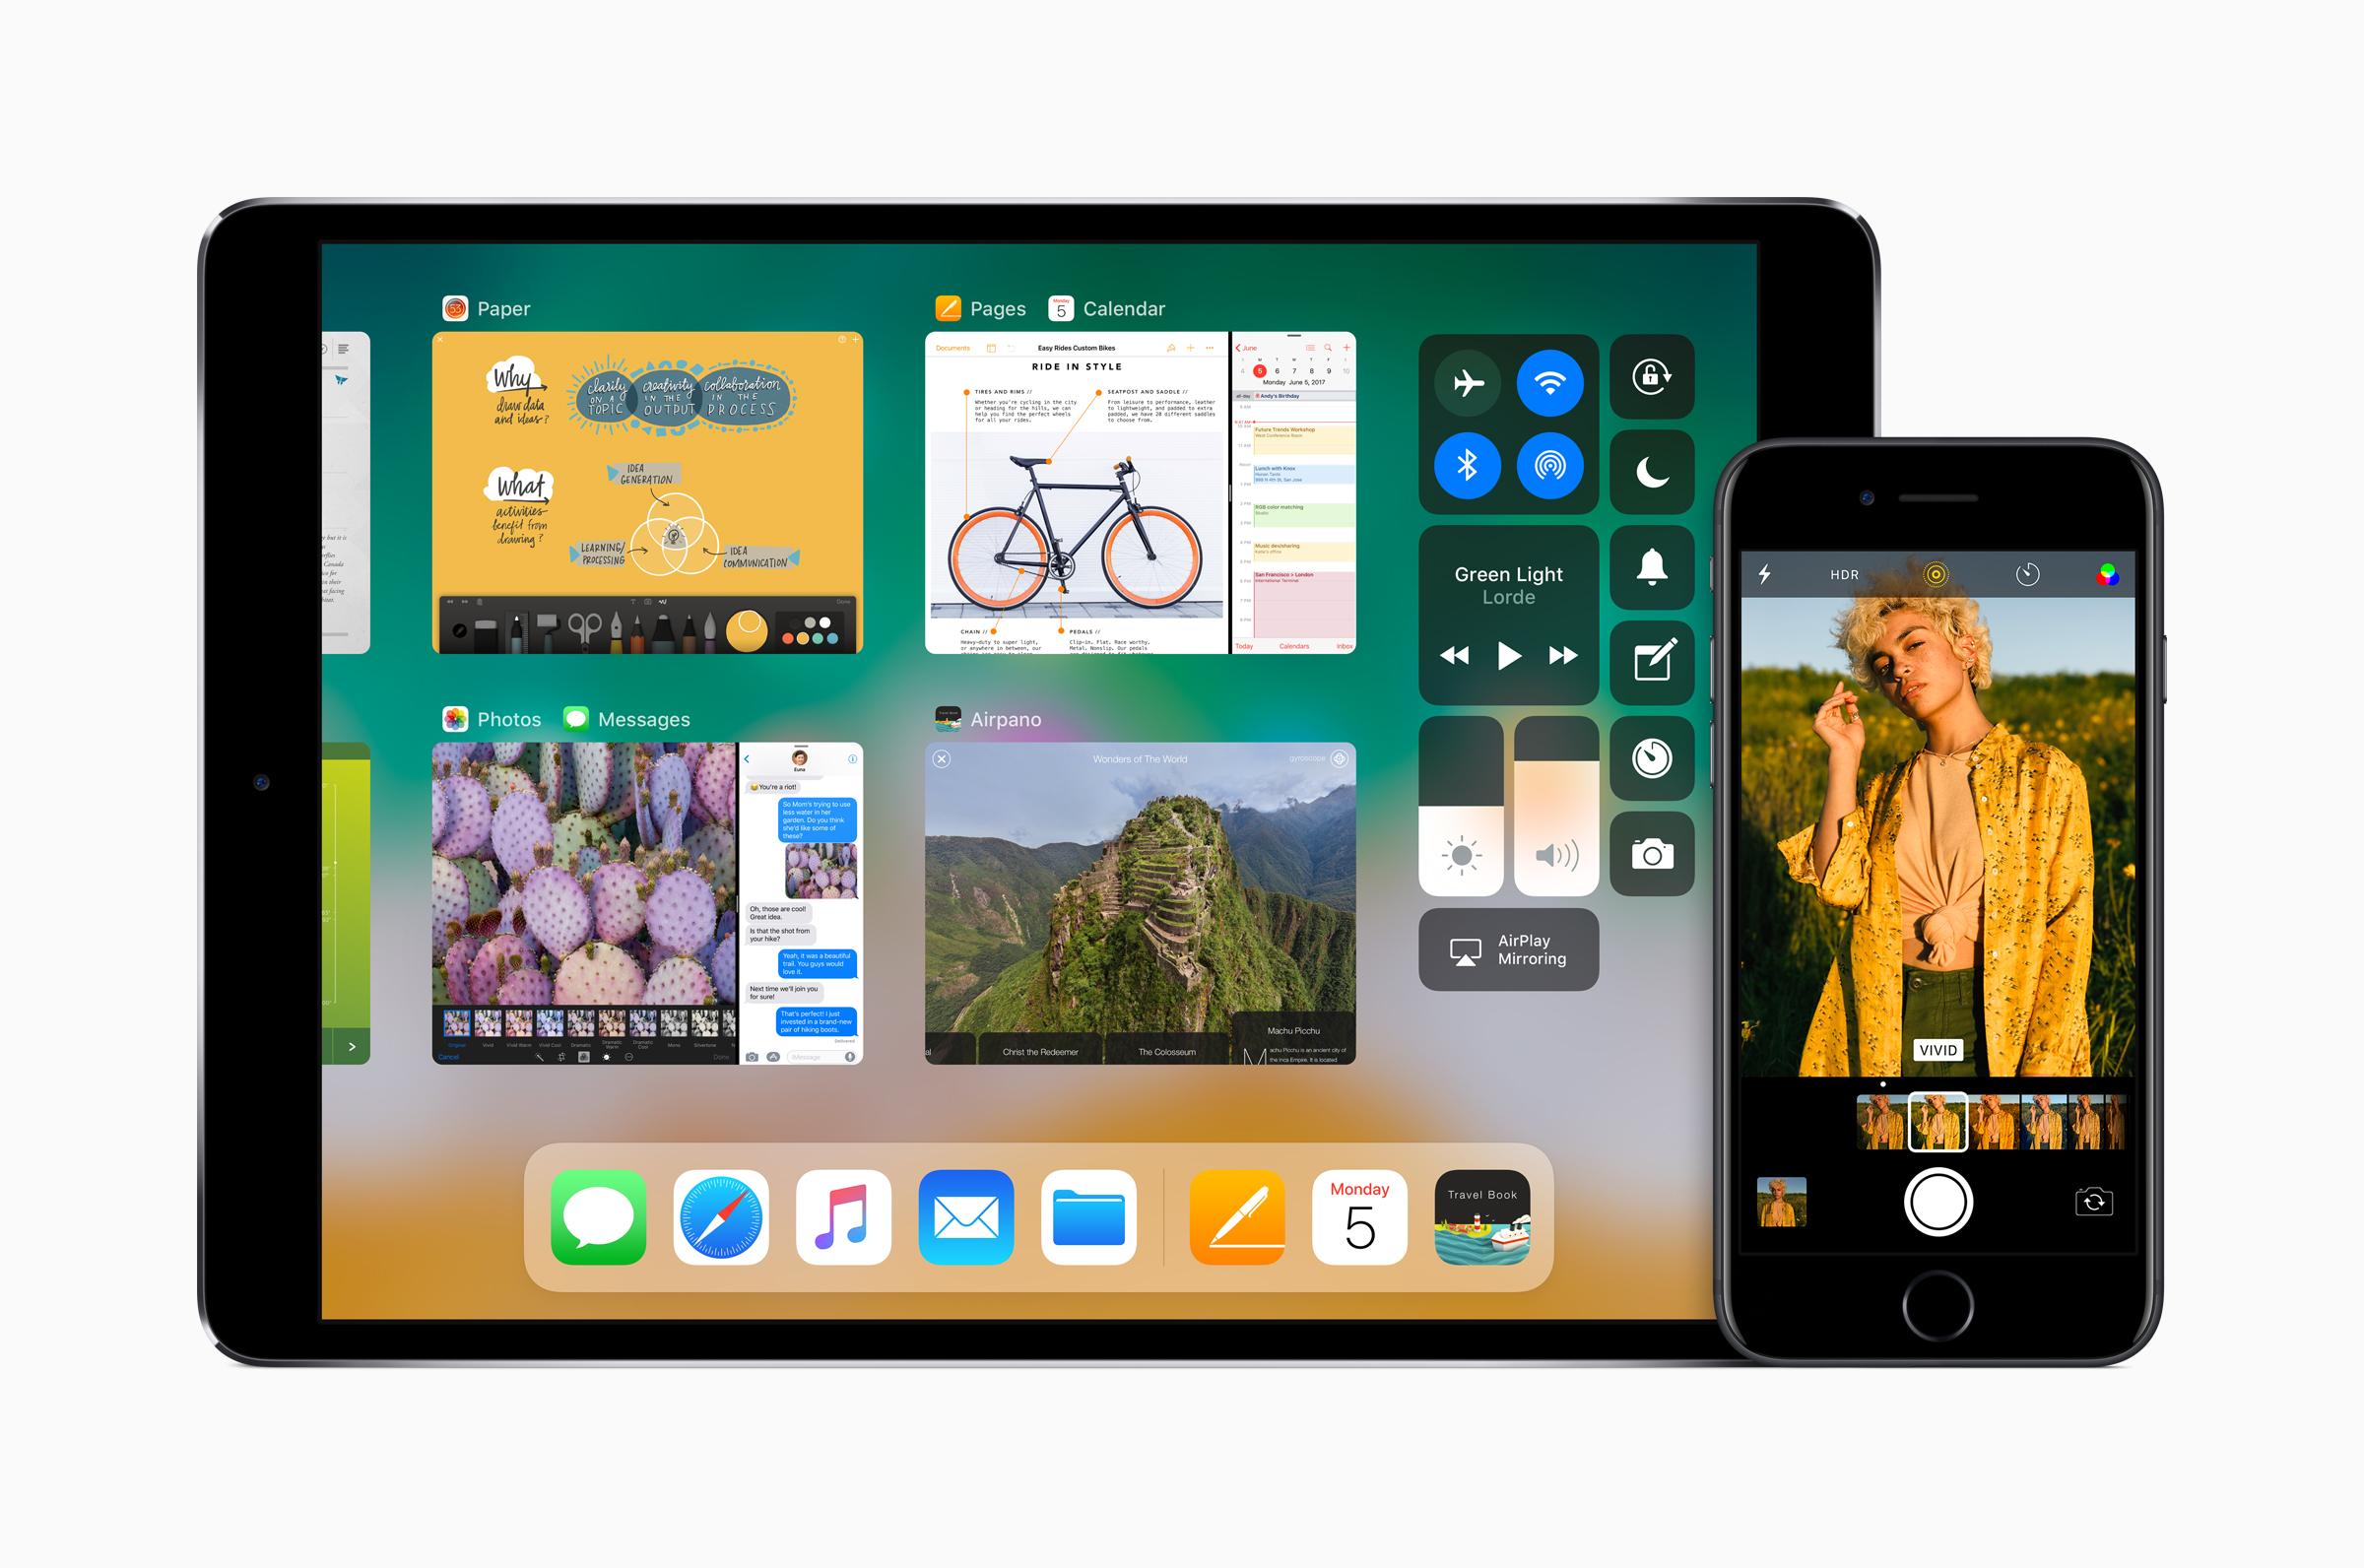 Apple's iPad and iPhone.